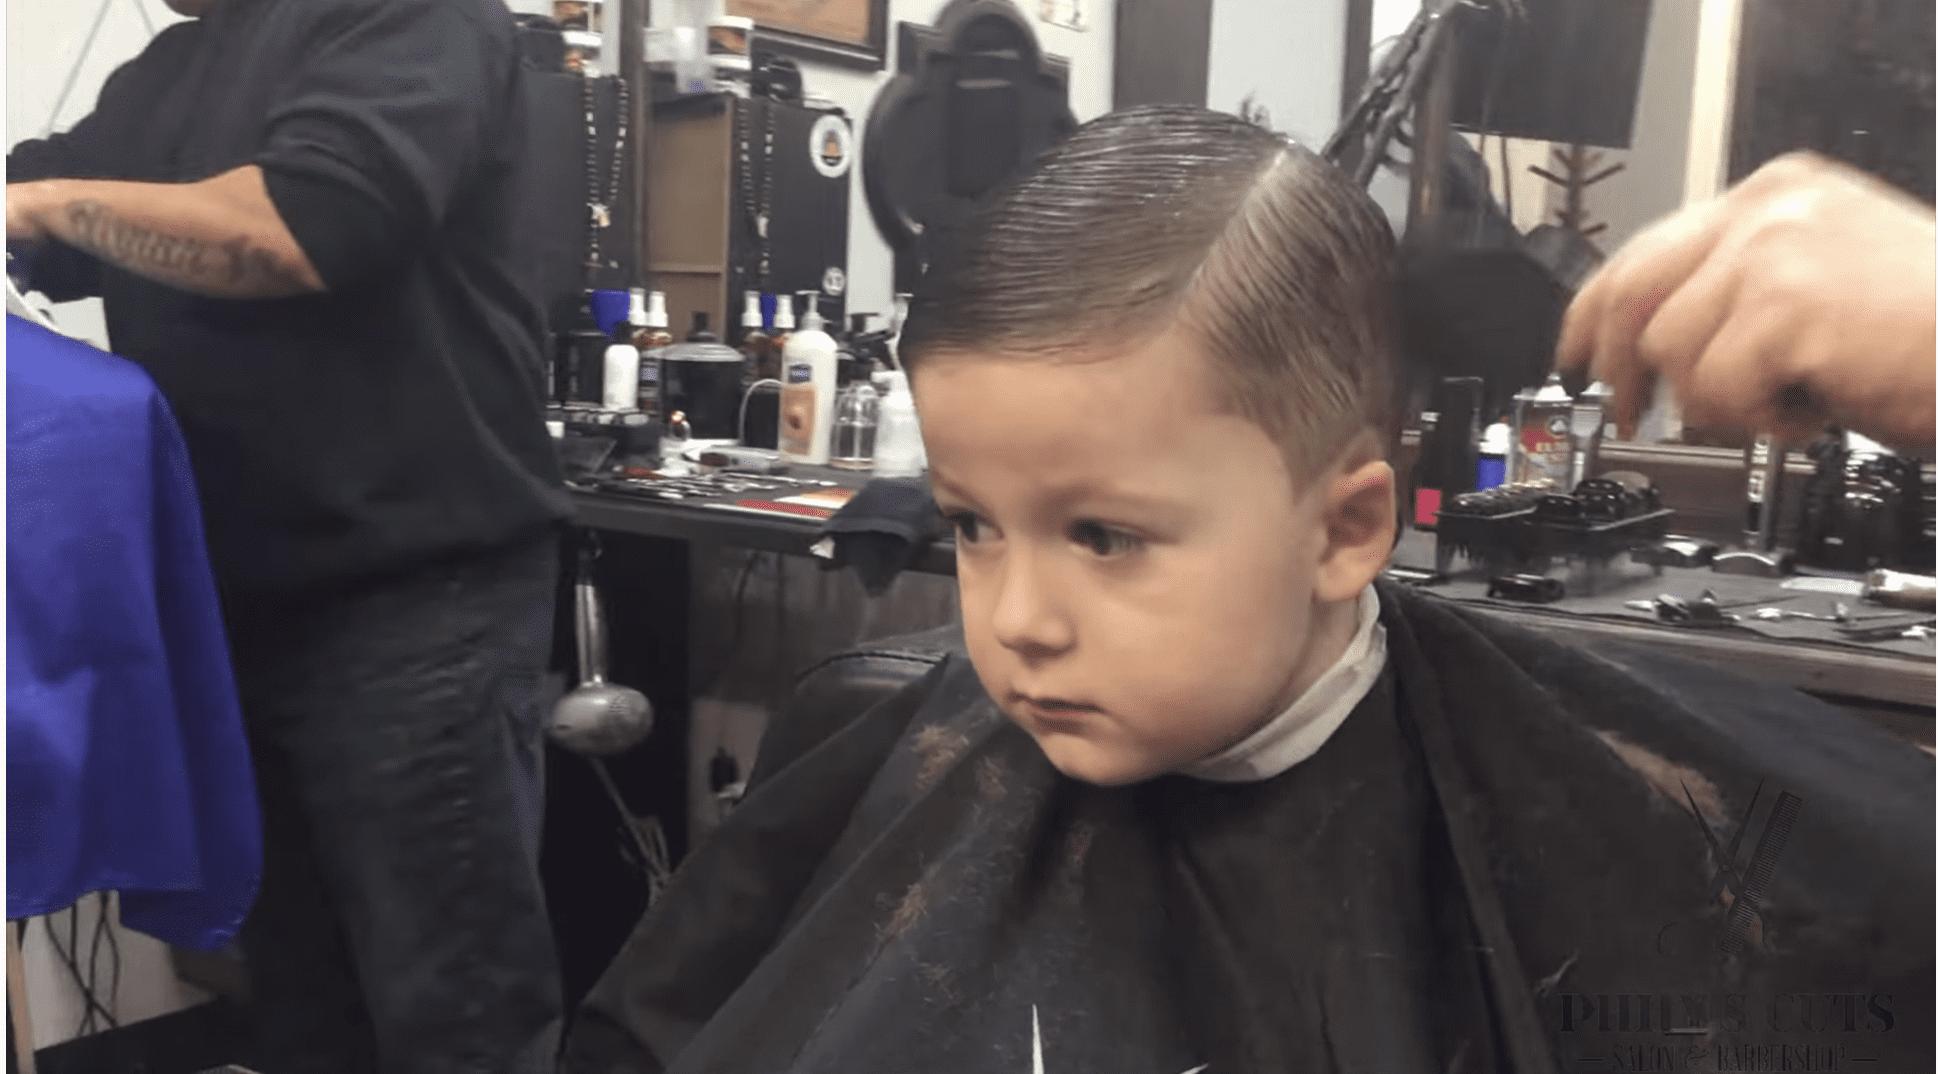 Phily's Cuts, Brick NJ, Children's haircut, hair, haircut, boy, part, combover